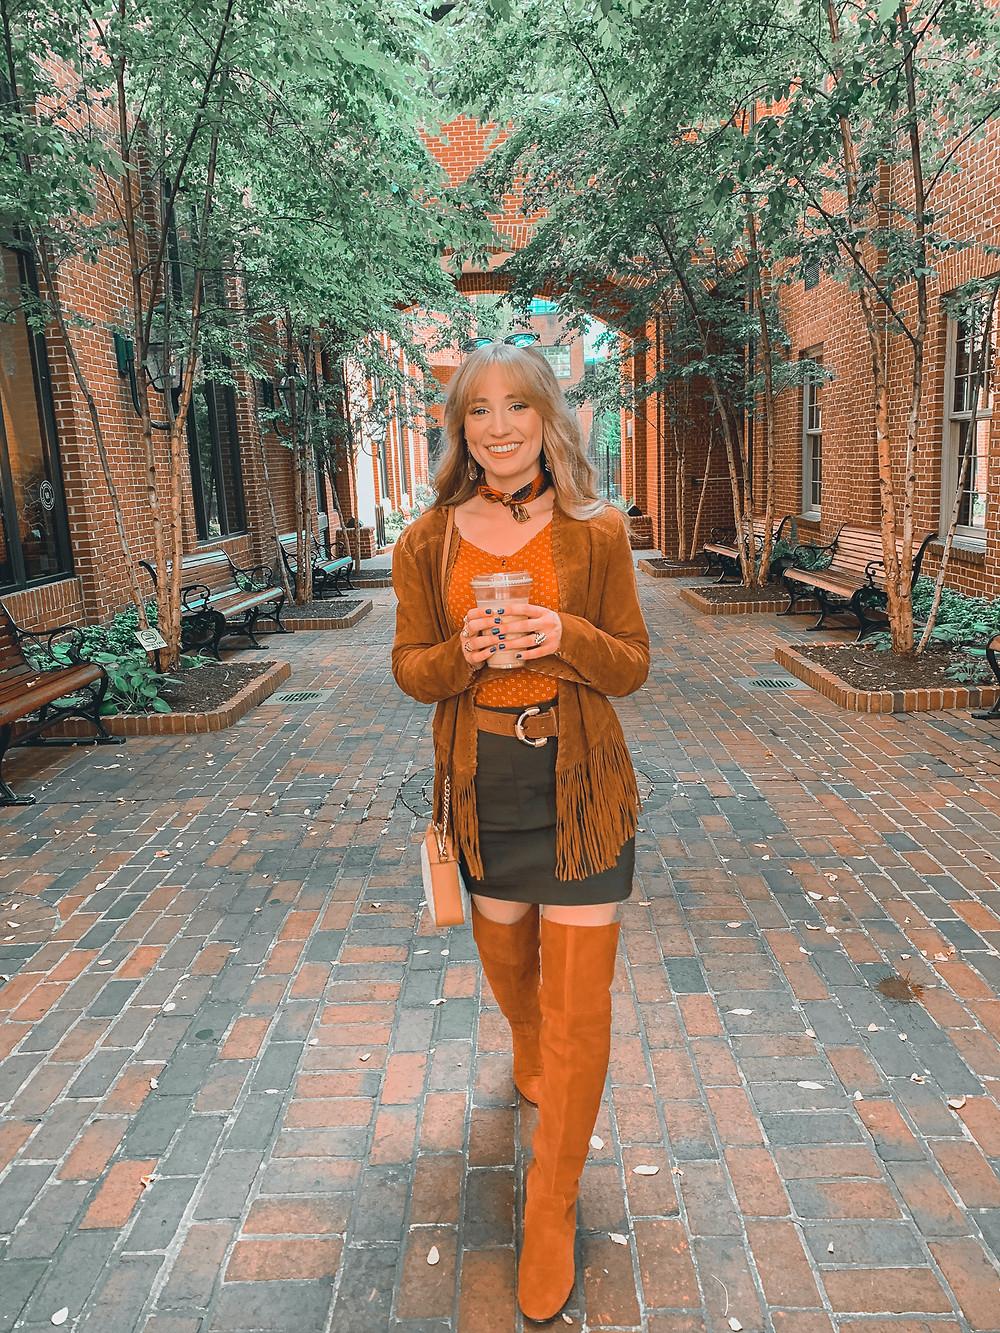 Blonde hair, scarf, orange shirt, brown suede fringe jacket, orange suede boots, dark green mini skirt, brown suede belt, brick building, brick walkway, green trees, street lights, benches